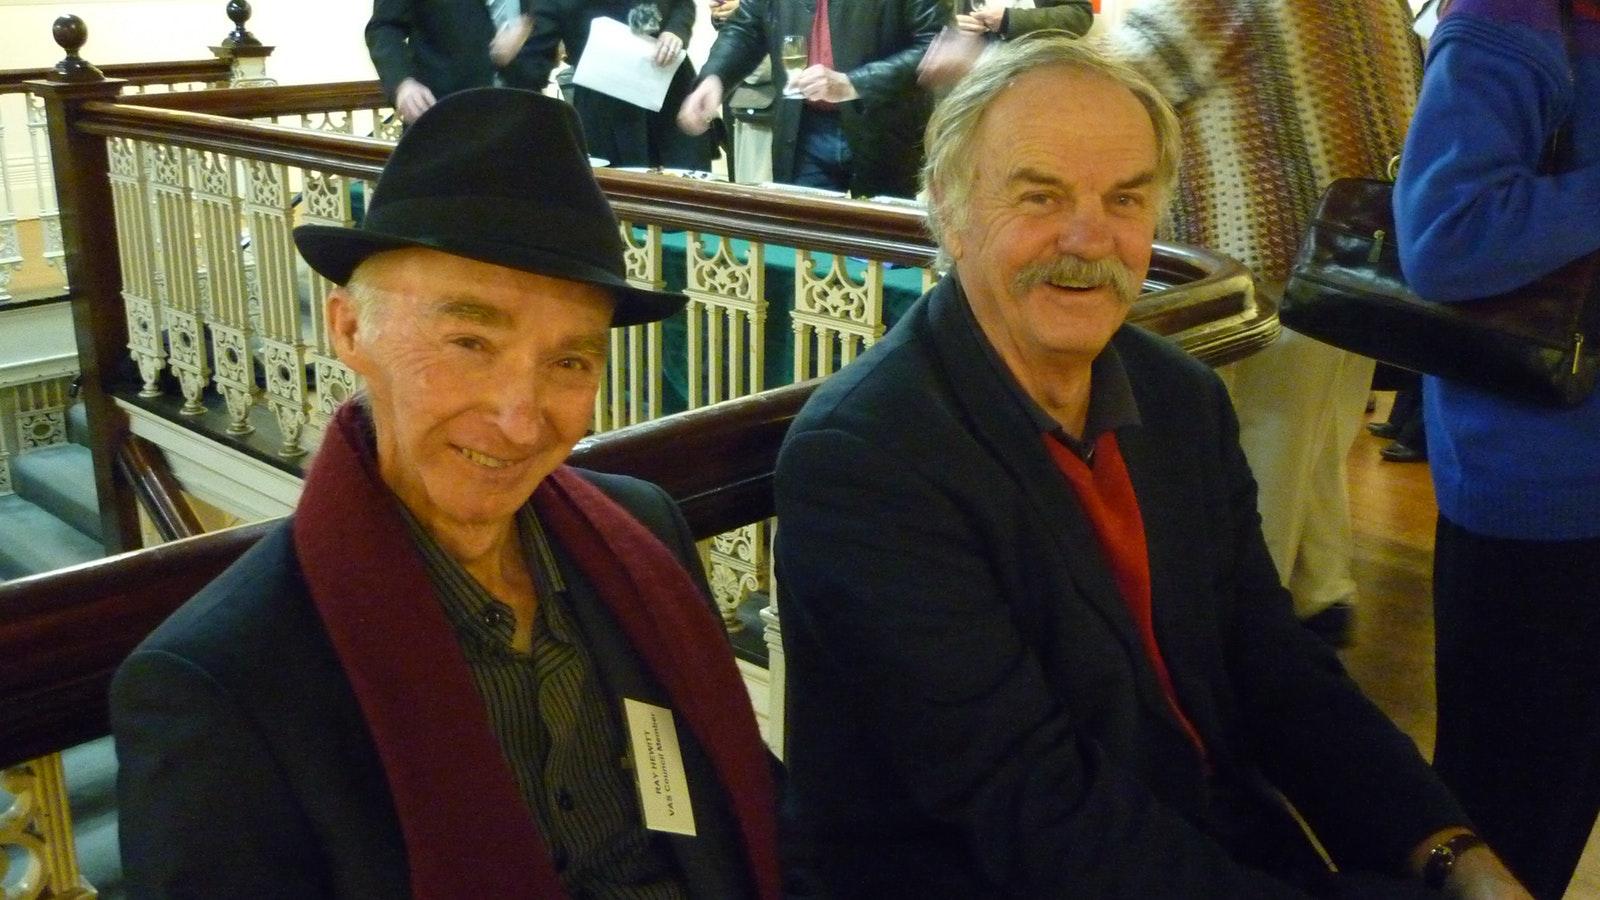 Ray Hewitt and Geoff Watson